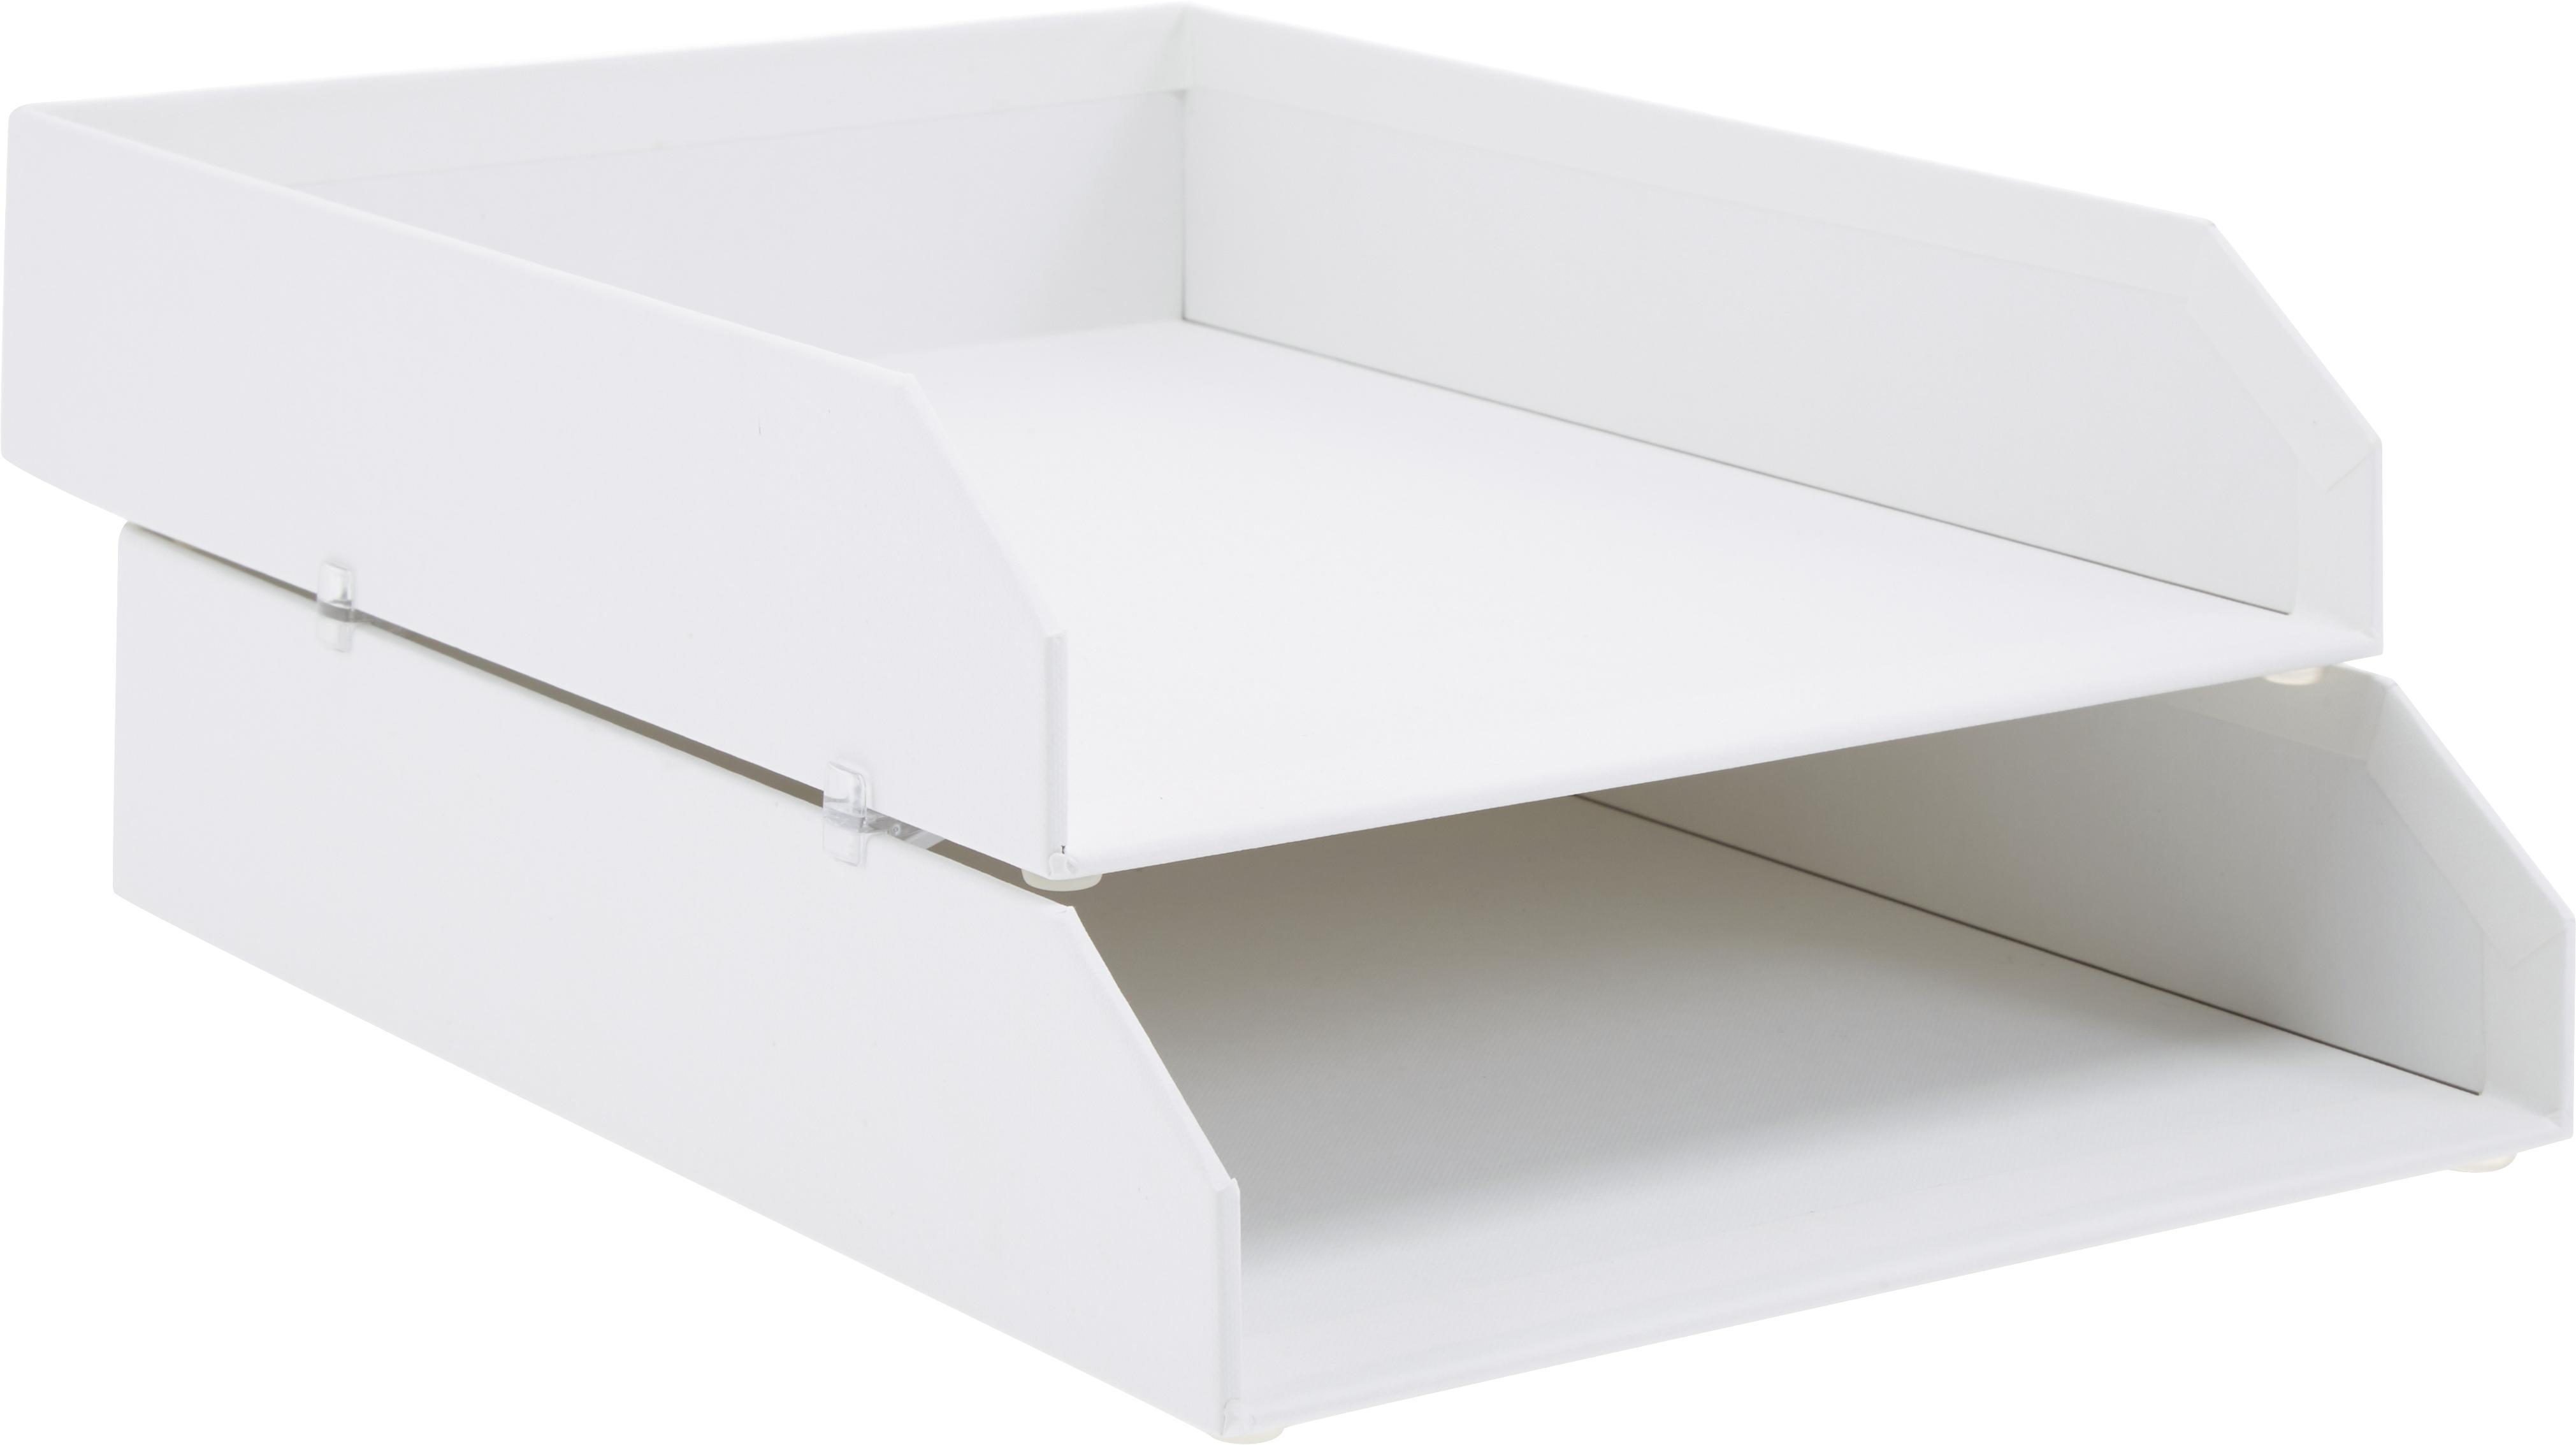 Organizer per documenti Hakan 2 pz, Solido, cartone laminato, Bianco, Larg. 23 x Prof. 31 cm